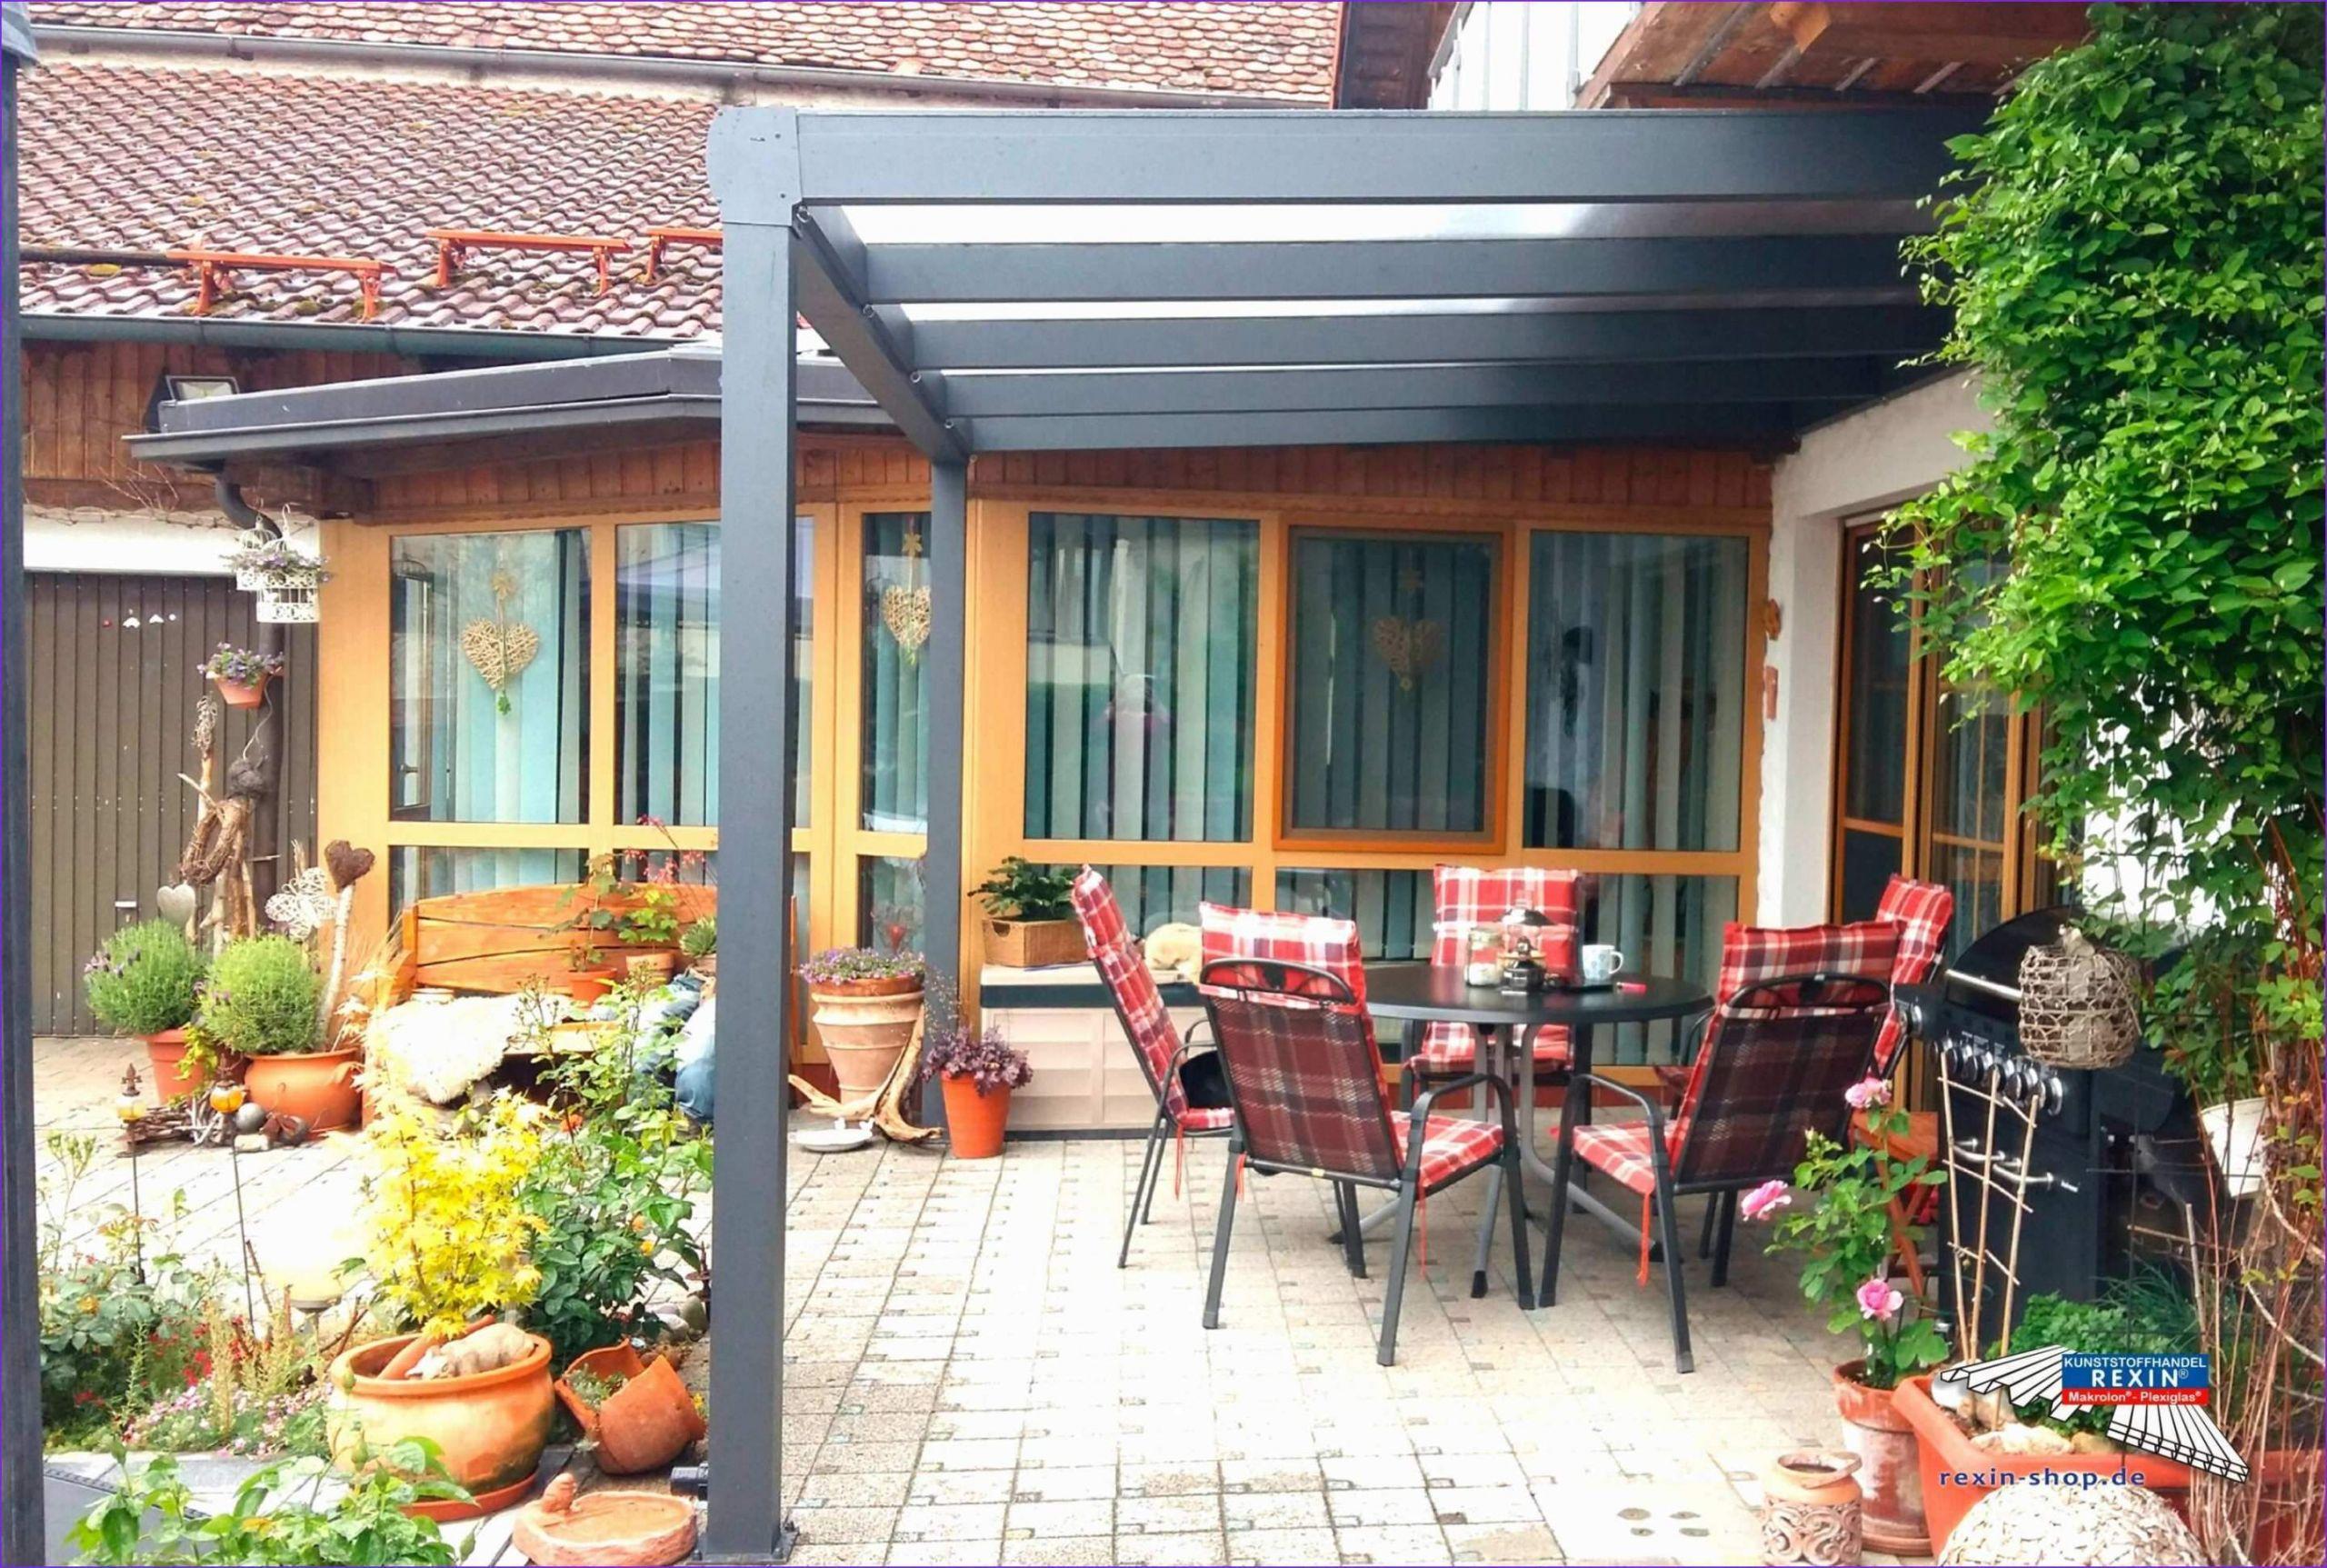 Garten Planen Neu Fototapete Selbst Gestalten Gunstig Luxus Garten Blickdicht Garten Anlegen